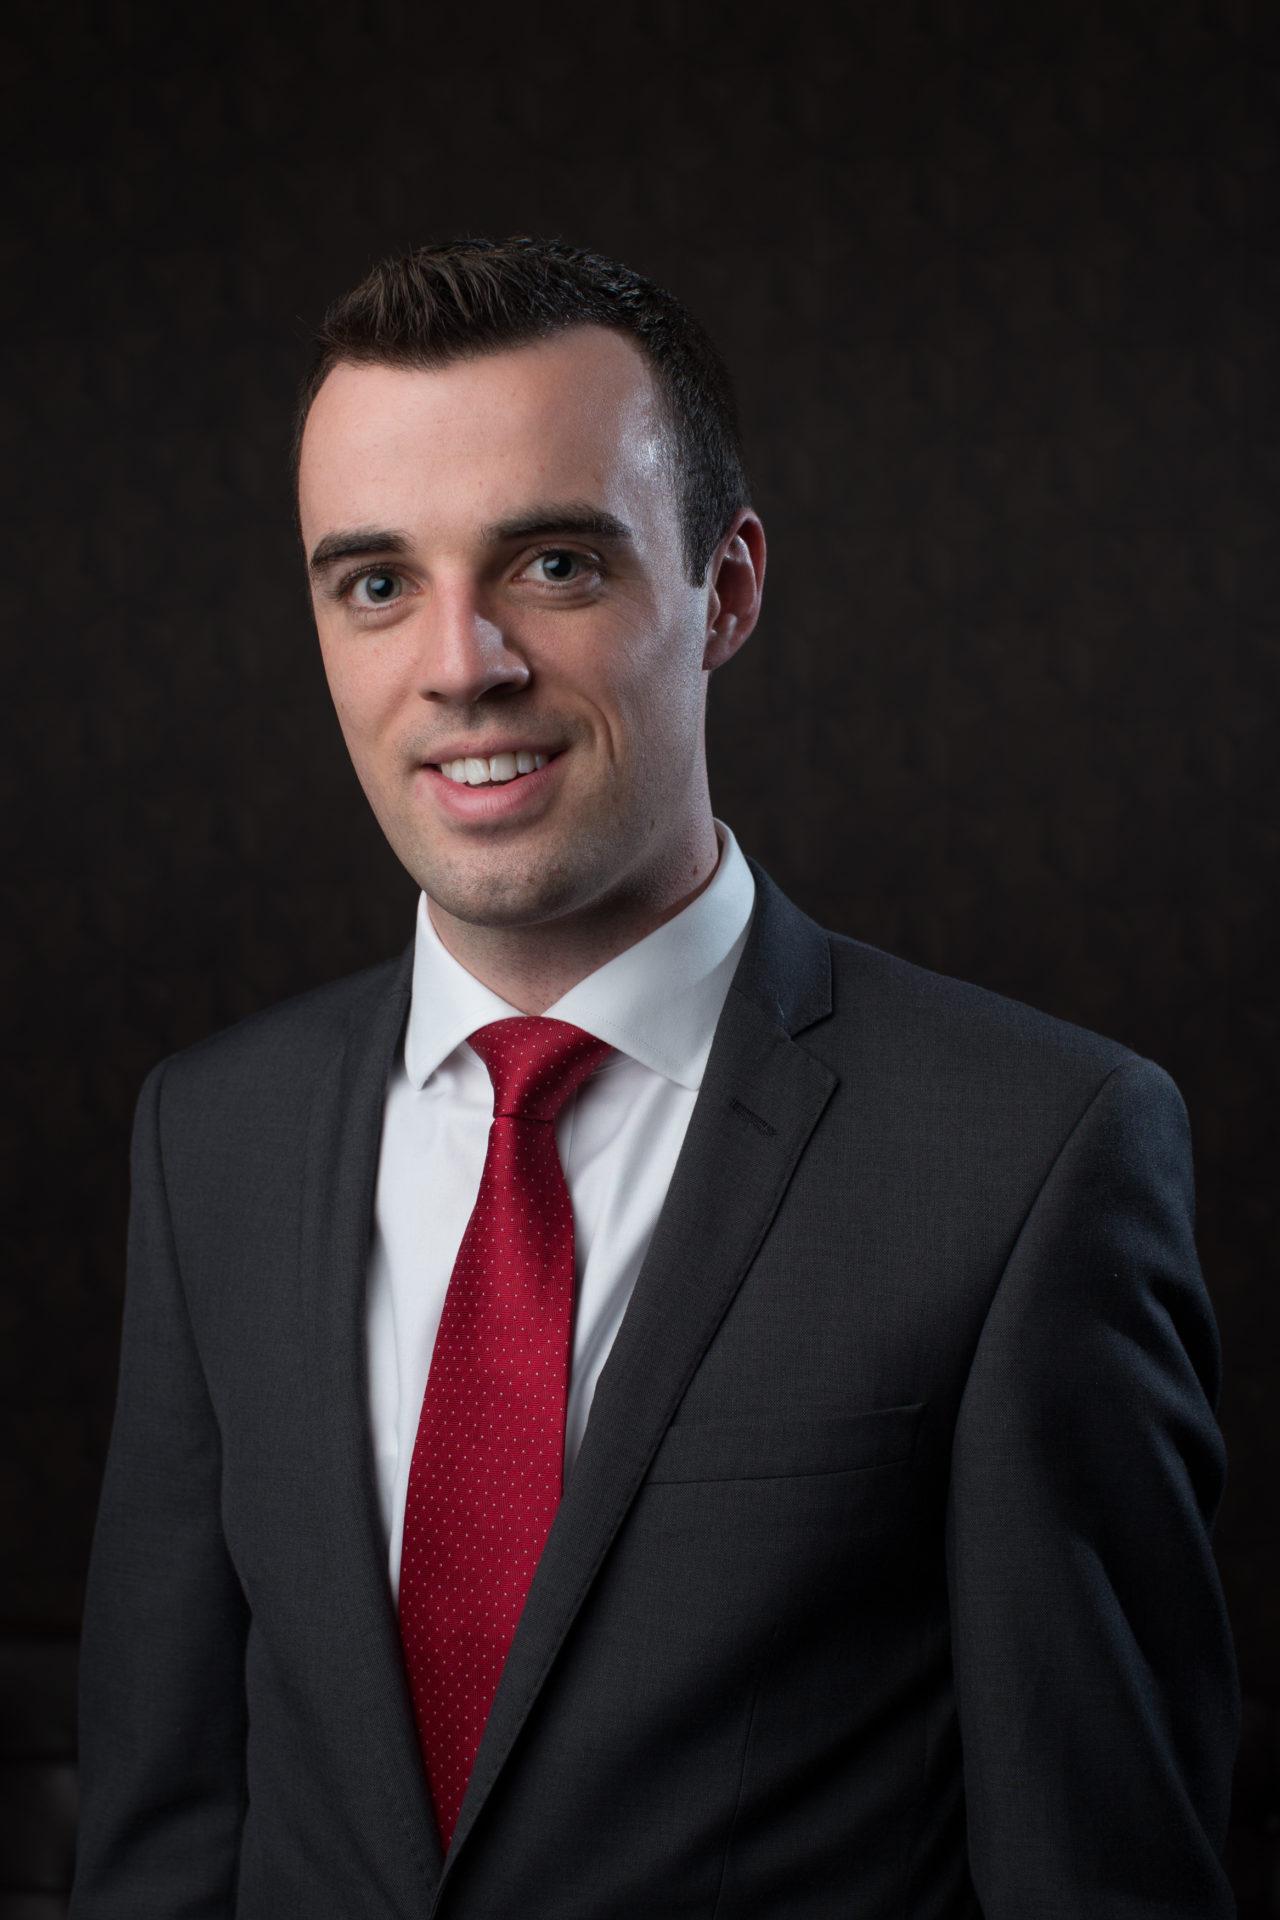 Gareth Hanna